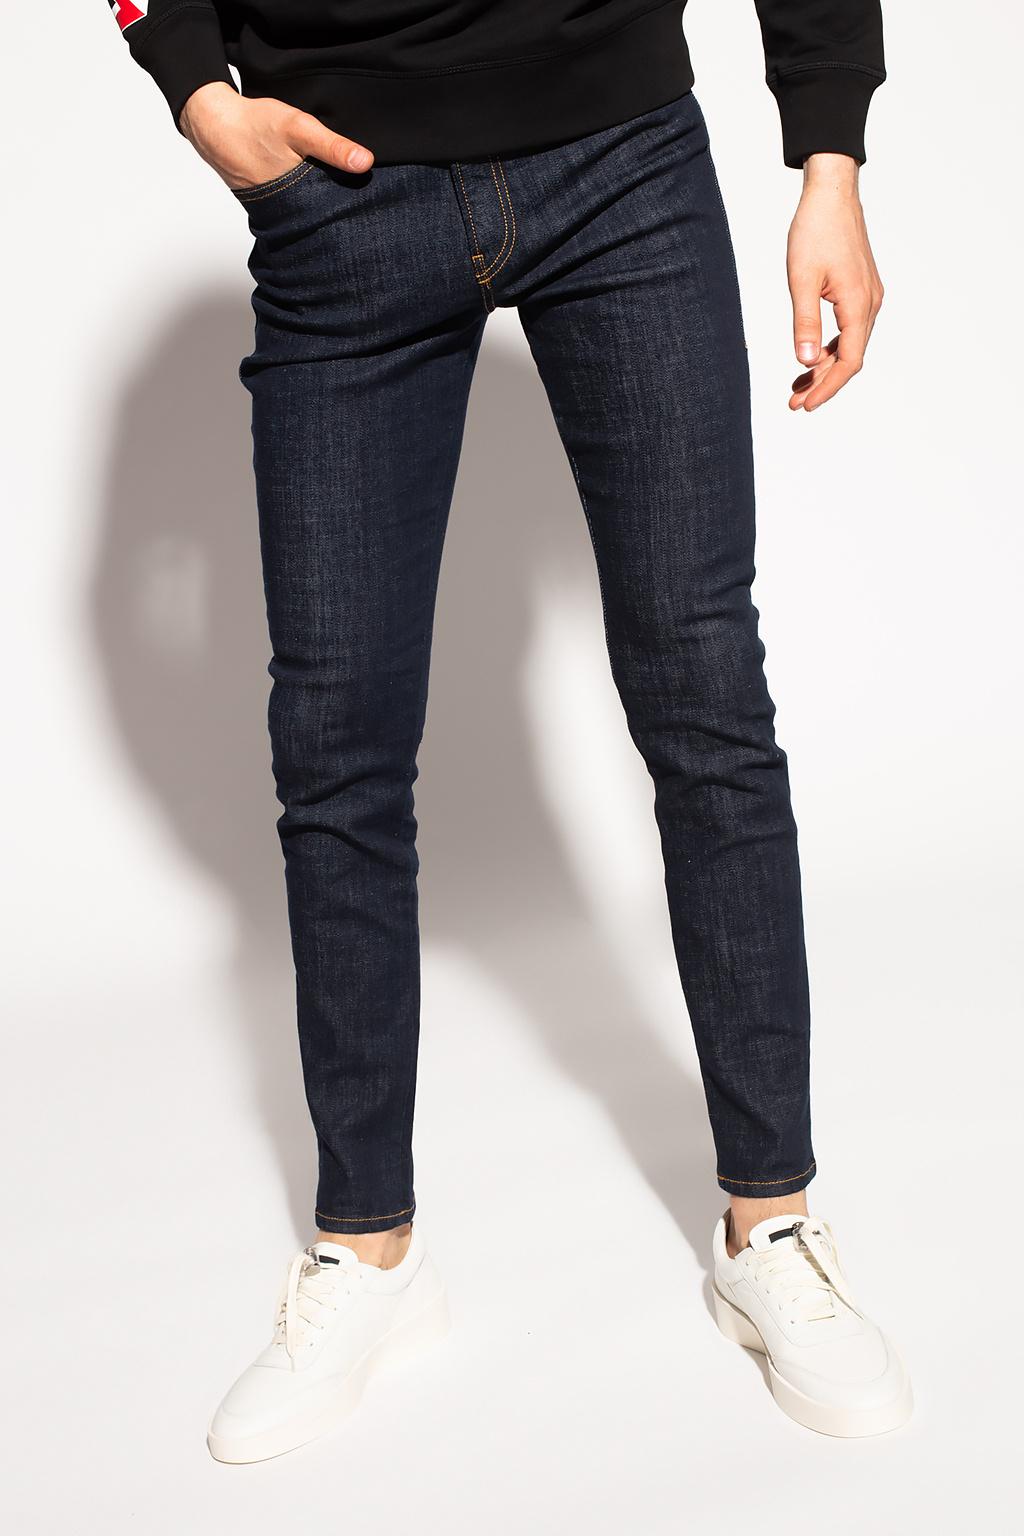 Diesel 'D-Amny' jeans